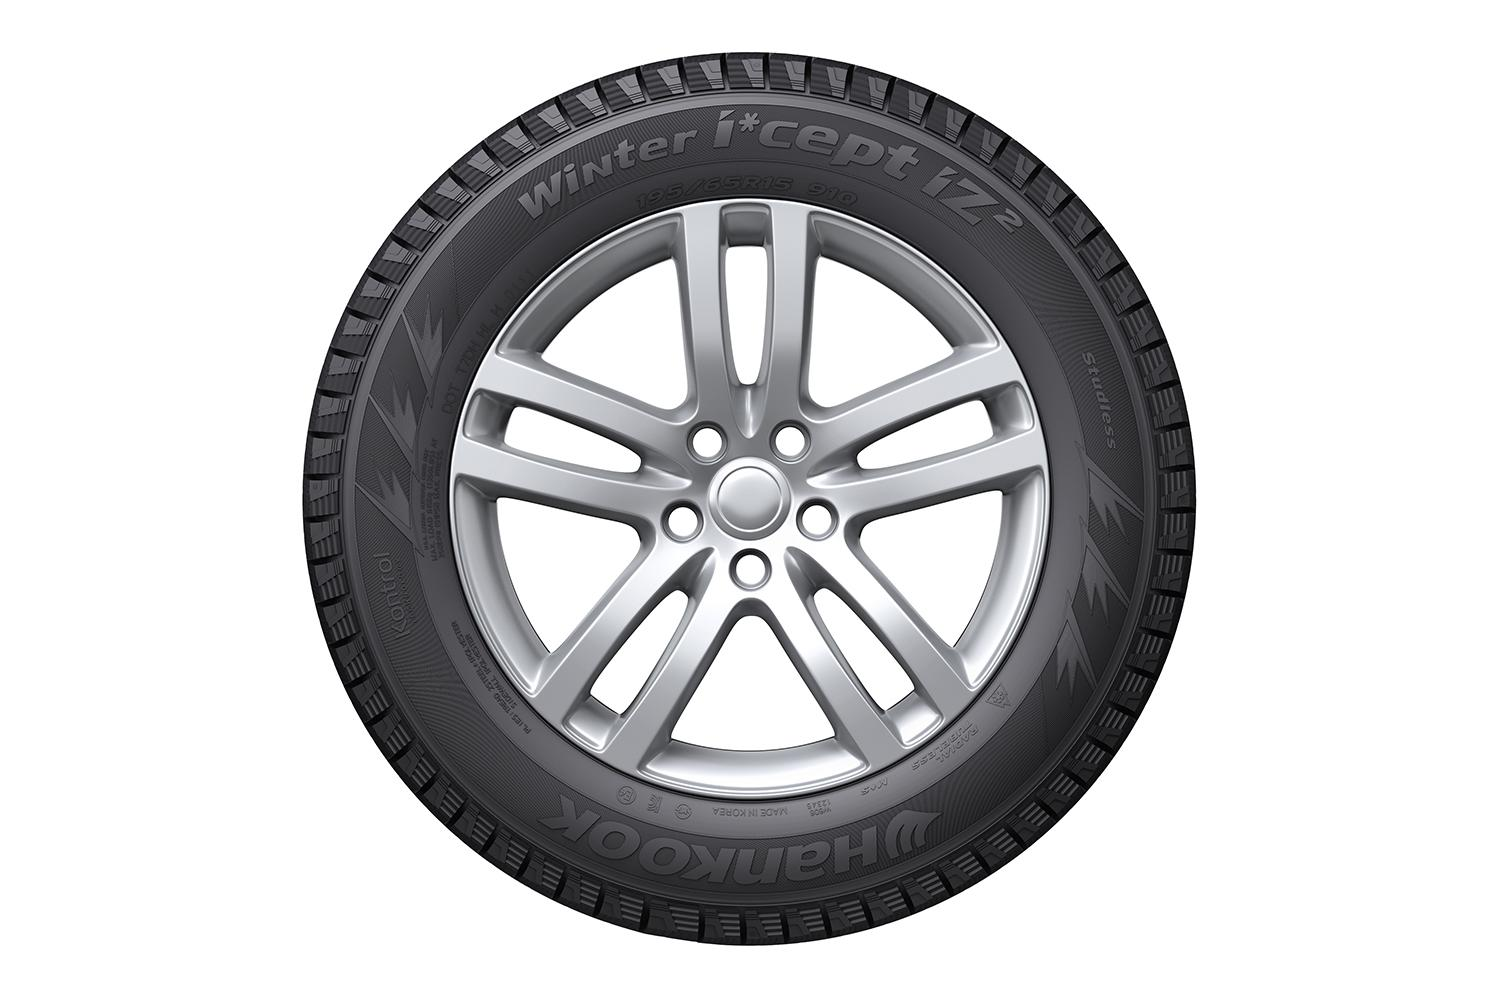 Hankook Tire представила новые зимние шины Winter i*Cept iZ²